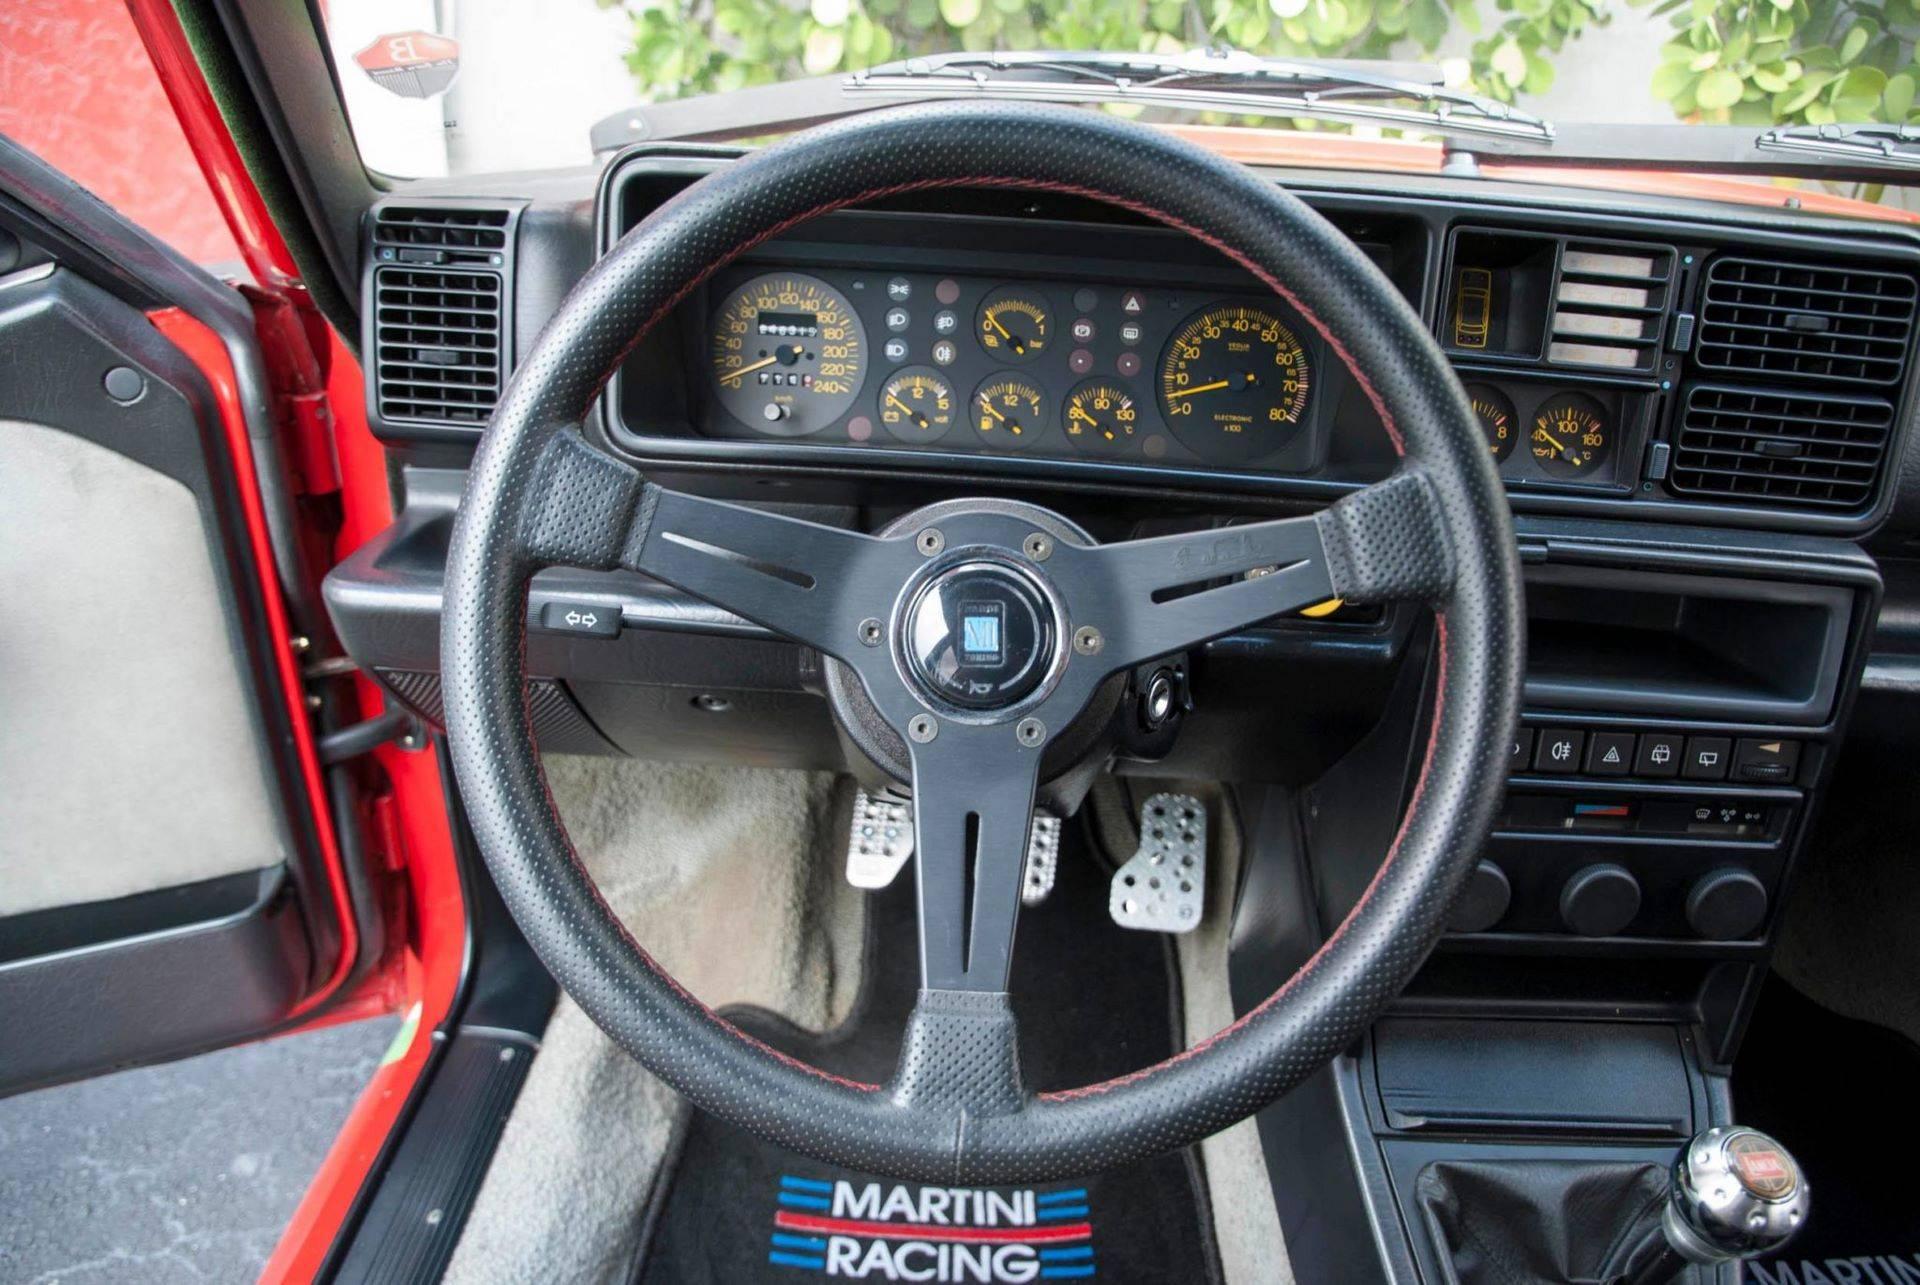 Lancia-Delta-Integrale-8V-1989-43